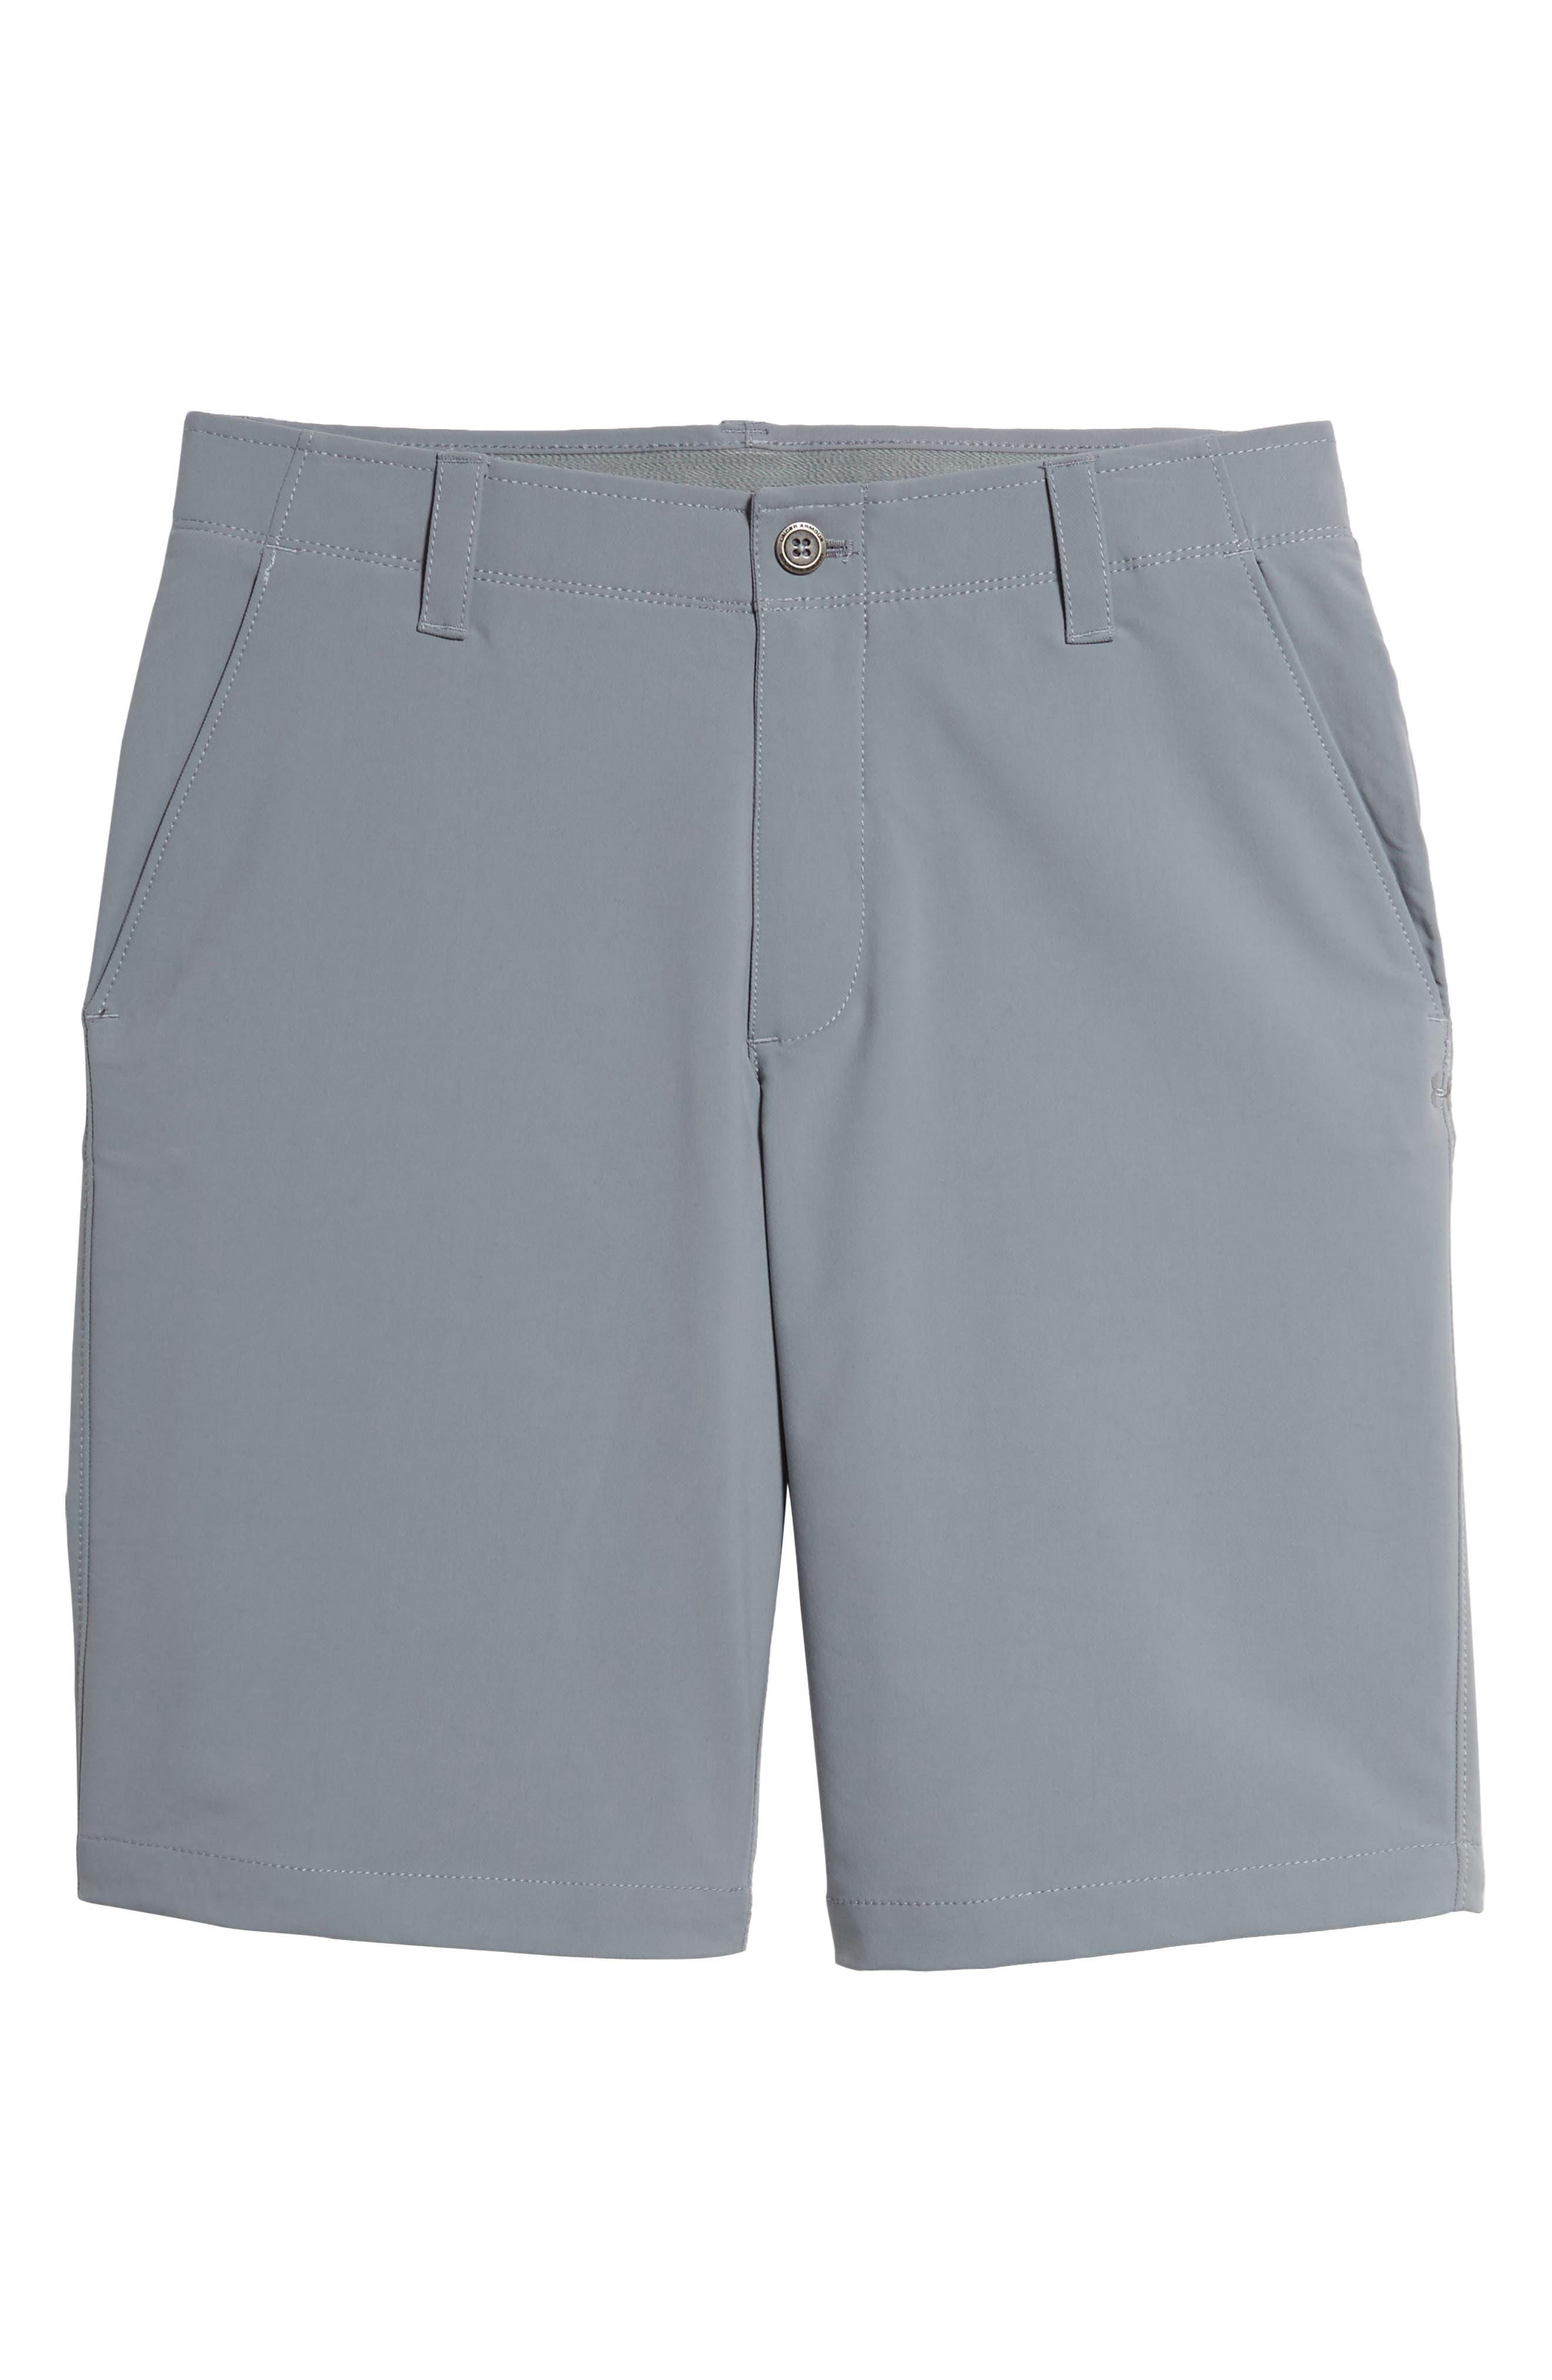 'Matchplay' Moisture Wicking Golf Shorts,                             Alternate thumbnail 2, color,                             035